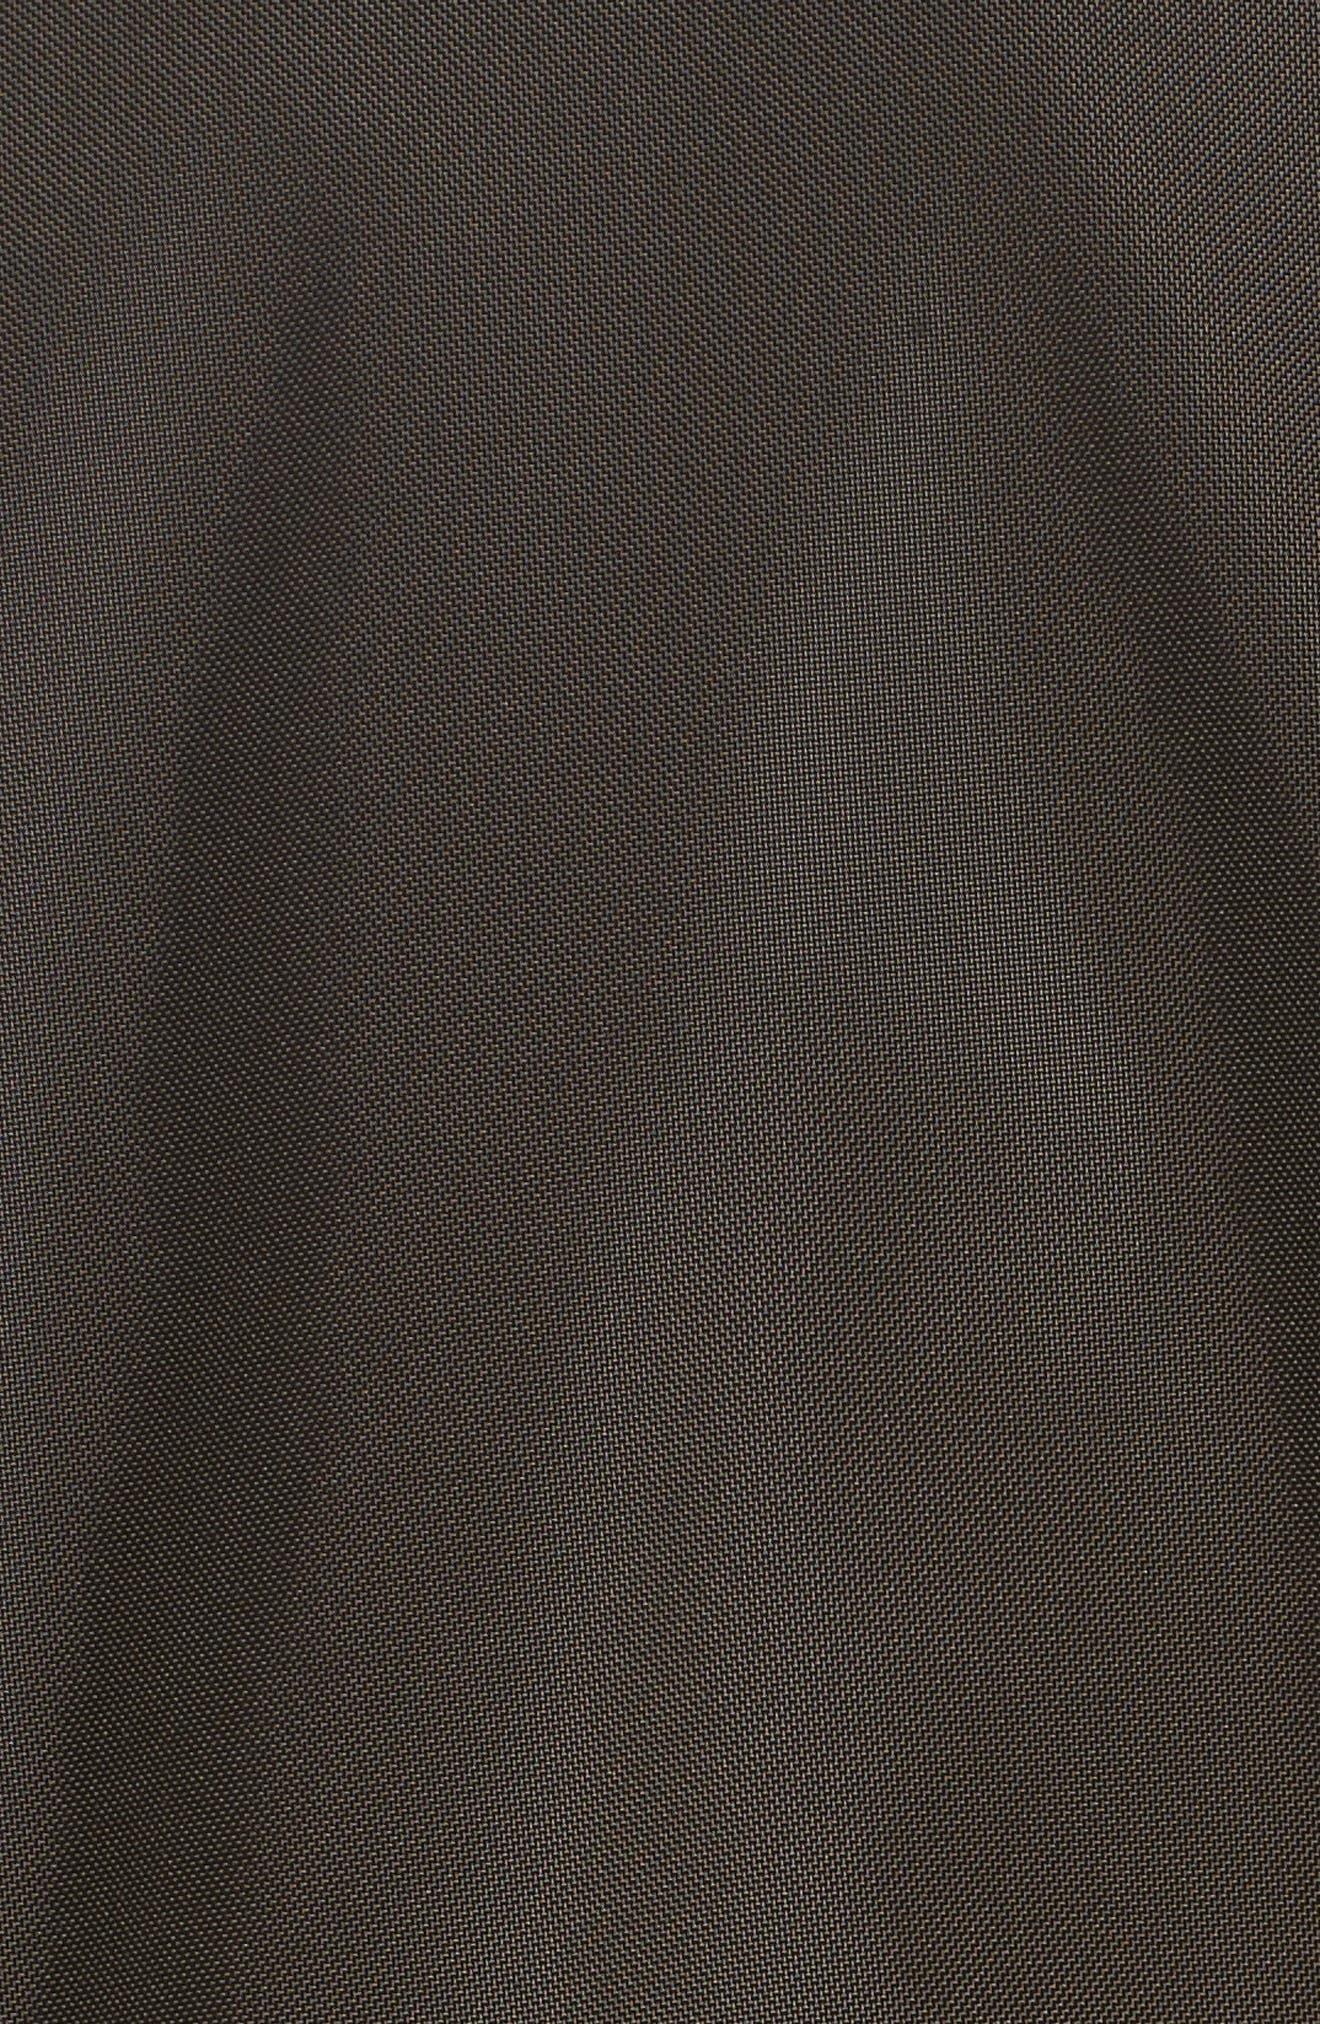 Cobra Aviator Jacket with Faux Fur Collar,                             Alternate thumbnail 6, color,                             342